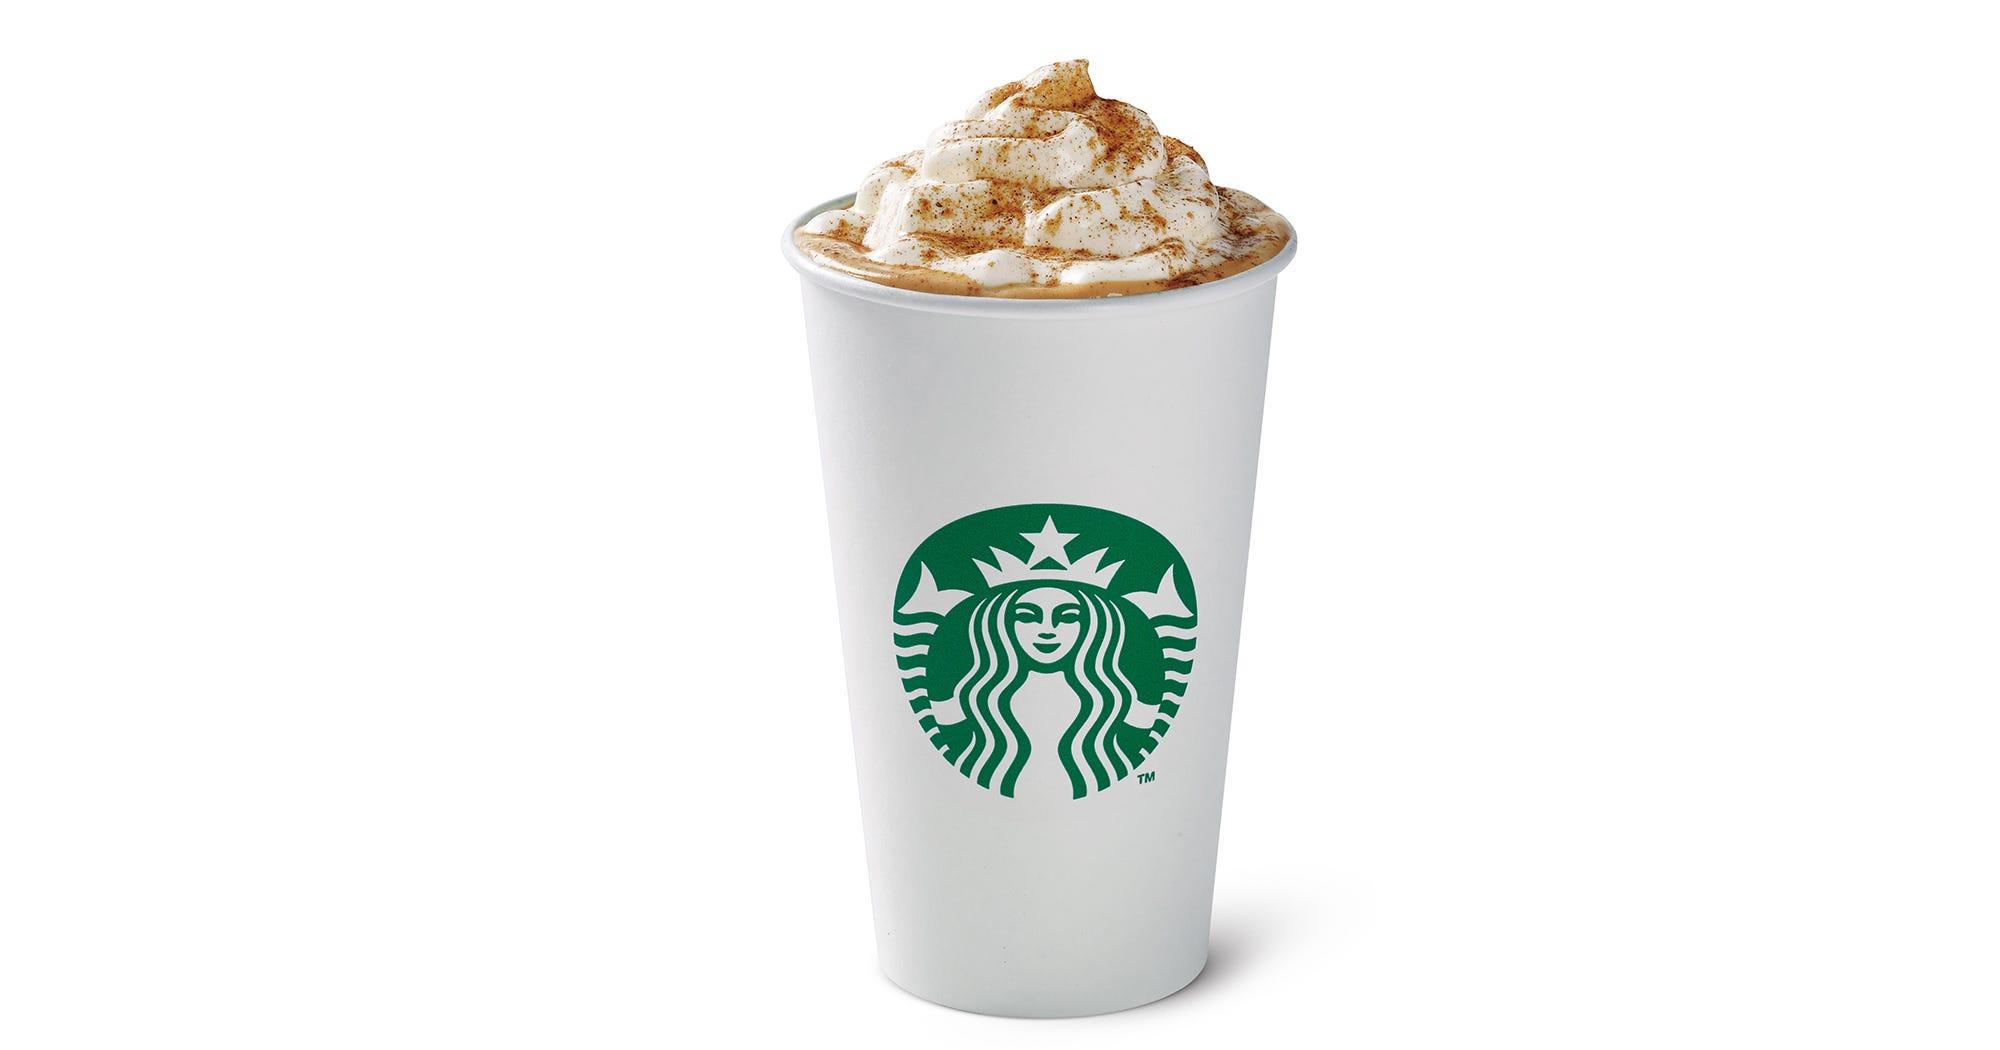 Starbucks Pumpkin Spice Latte Back On Fall Menu Today